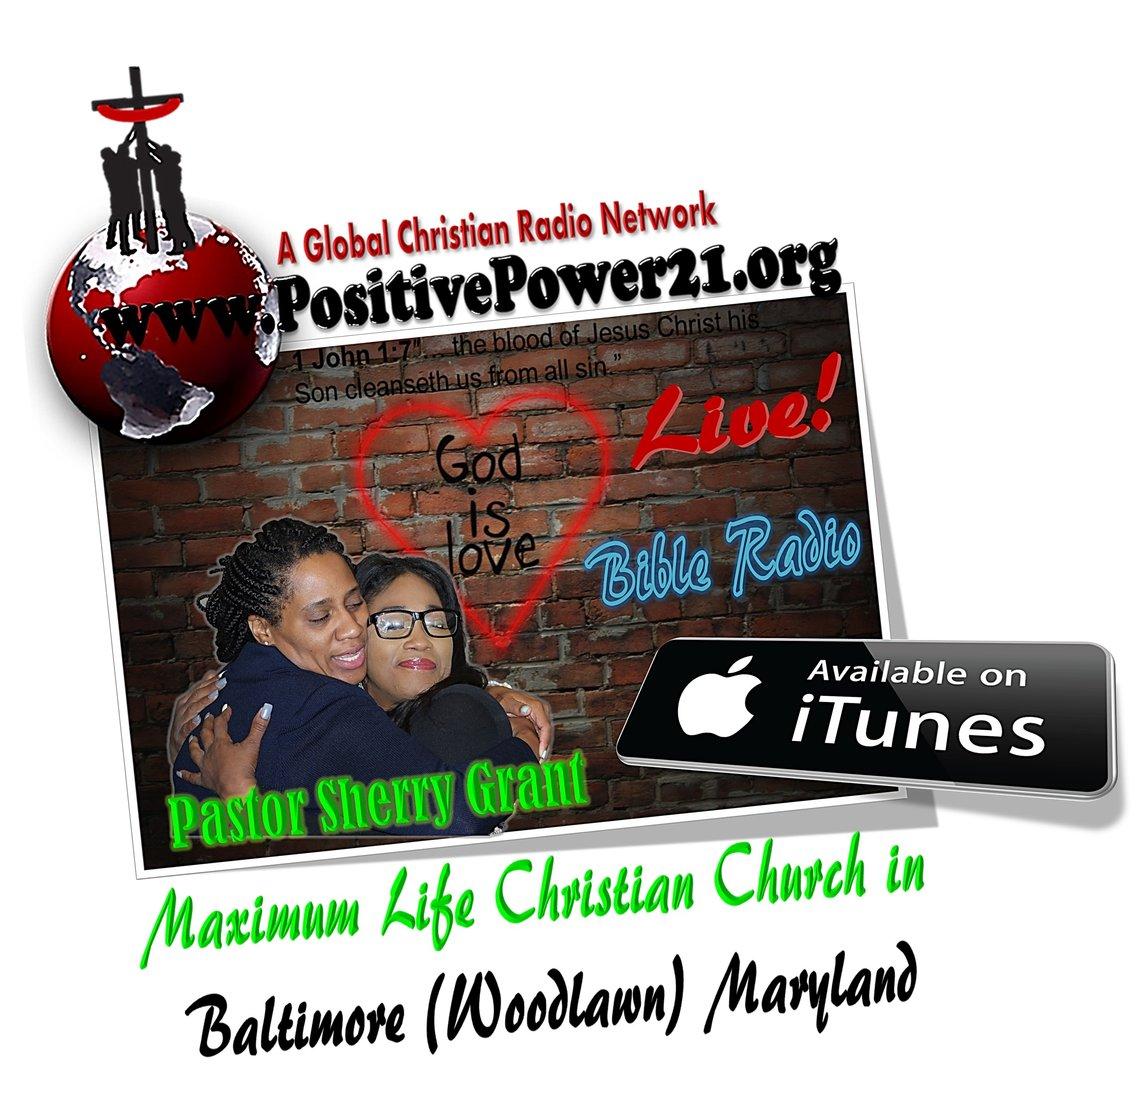 Maximum Life Christian Church - Balto - immagine di copertina